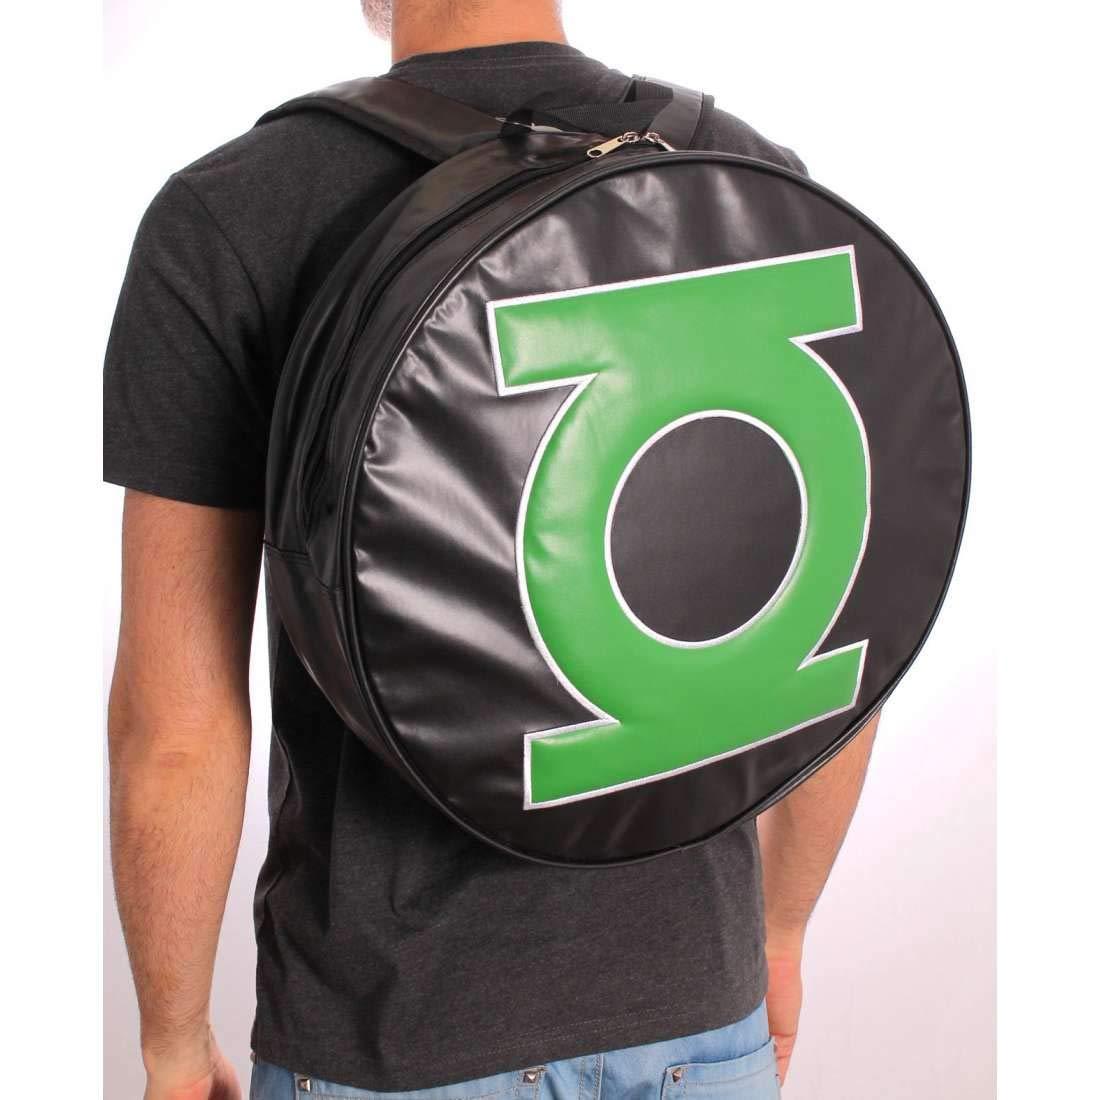 Grün Lantern Laterne grün, groß rund, Logo Rückseite Pack